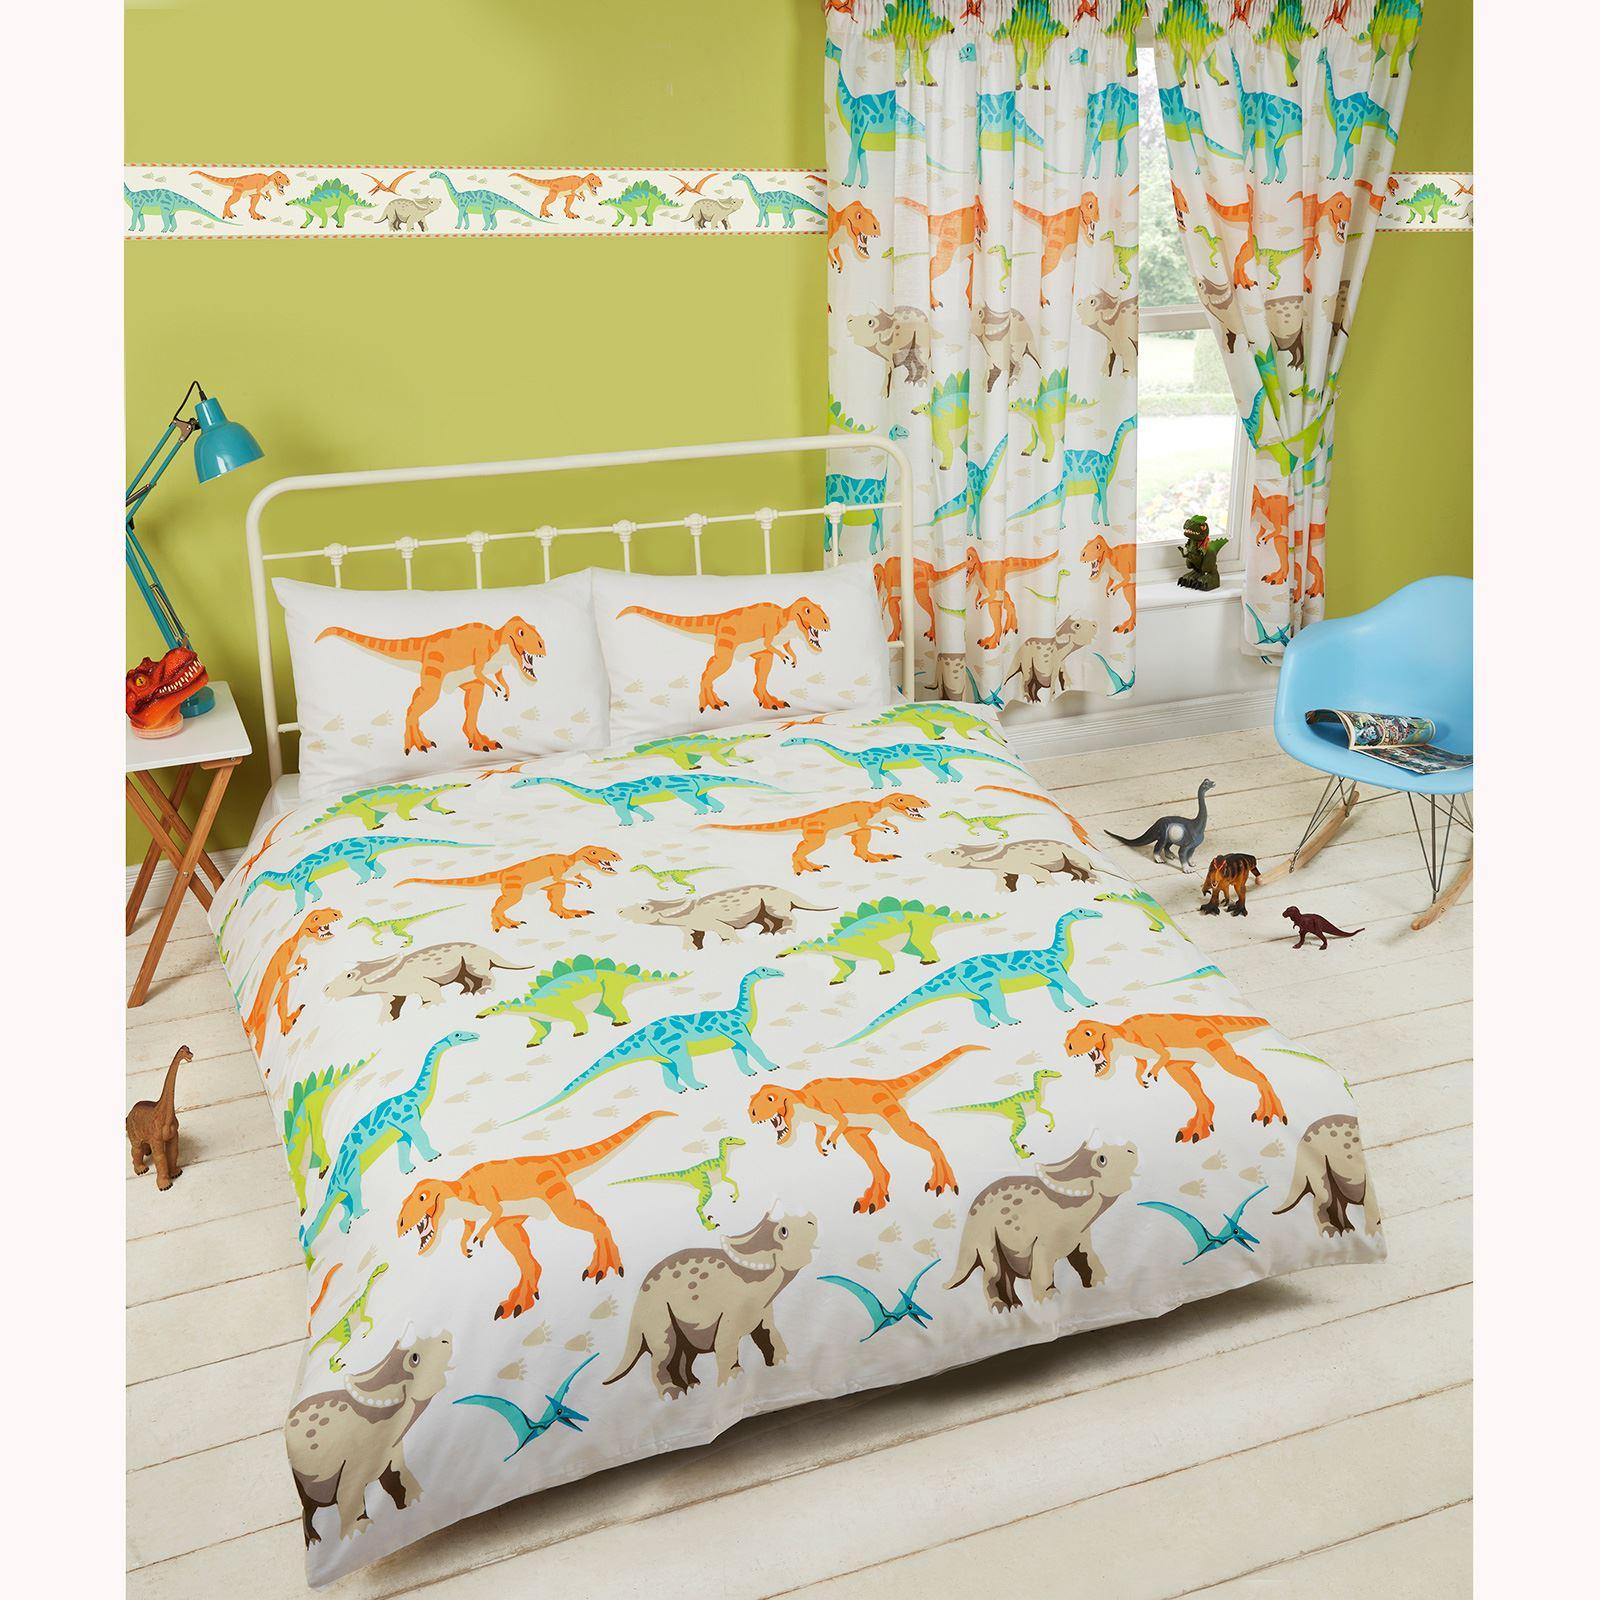 Dinosaur World Kids Matching Bedding Sets Curtains